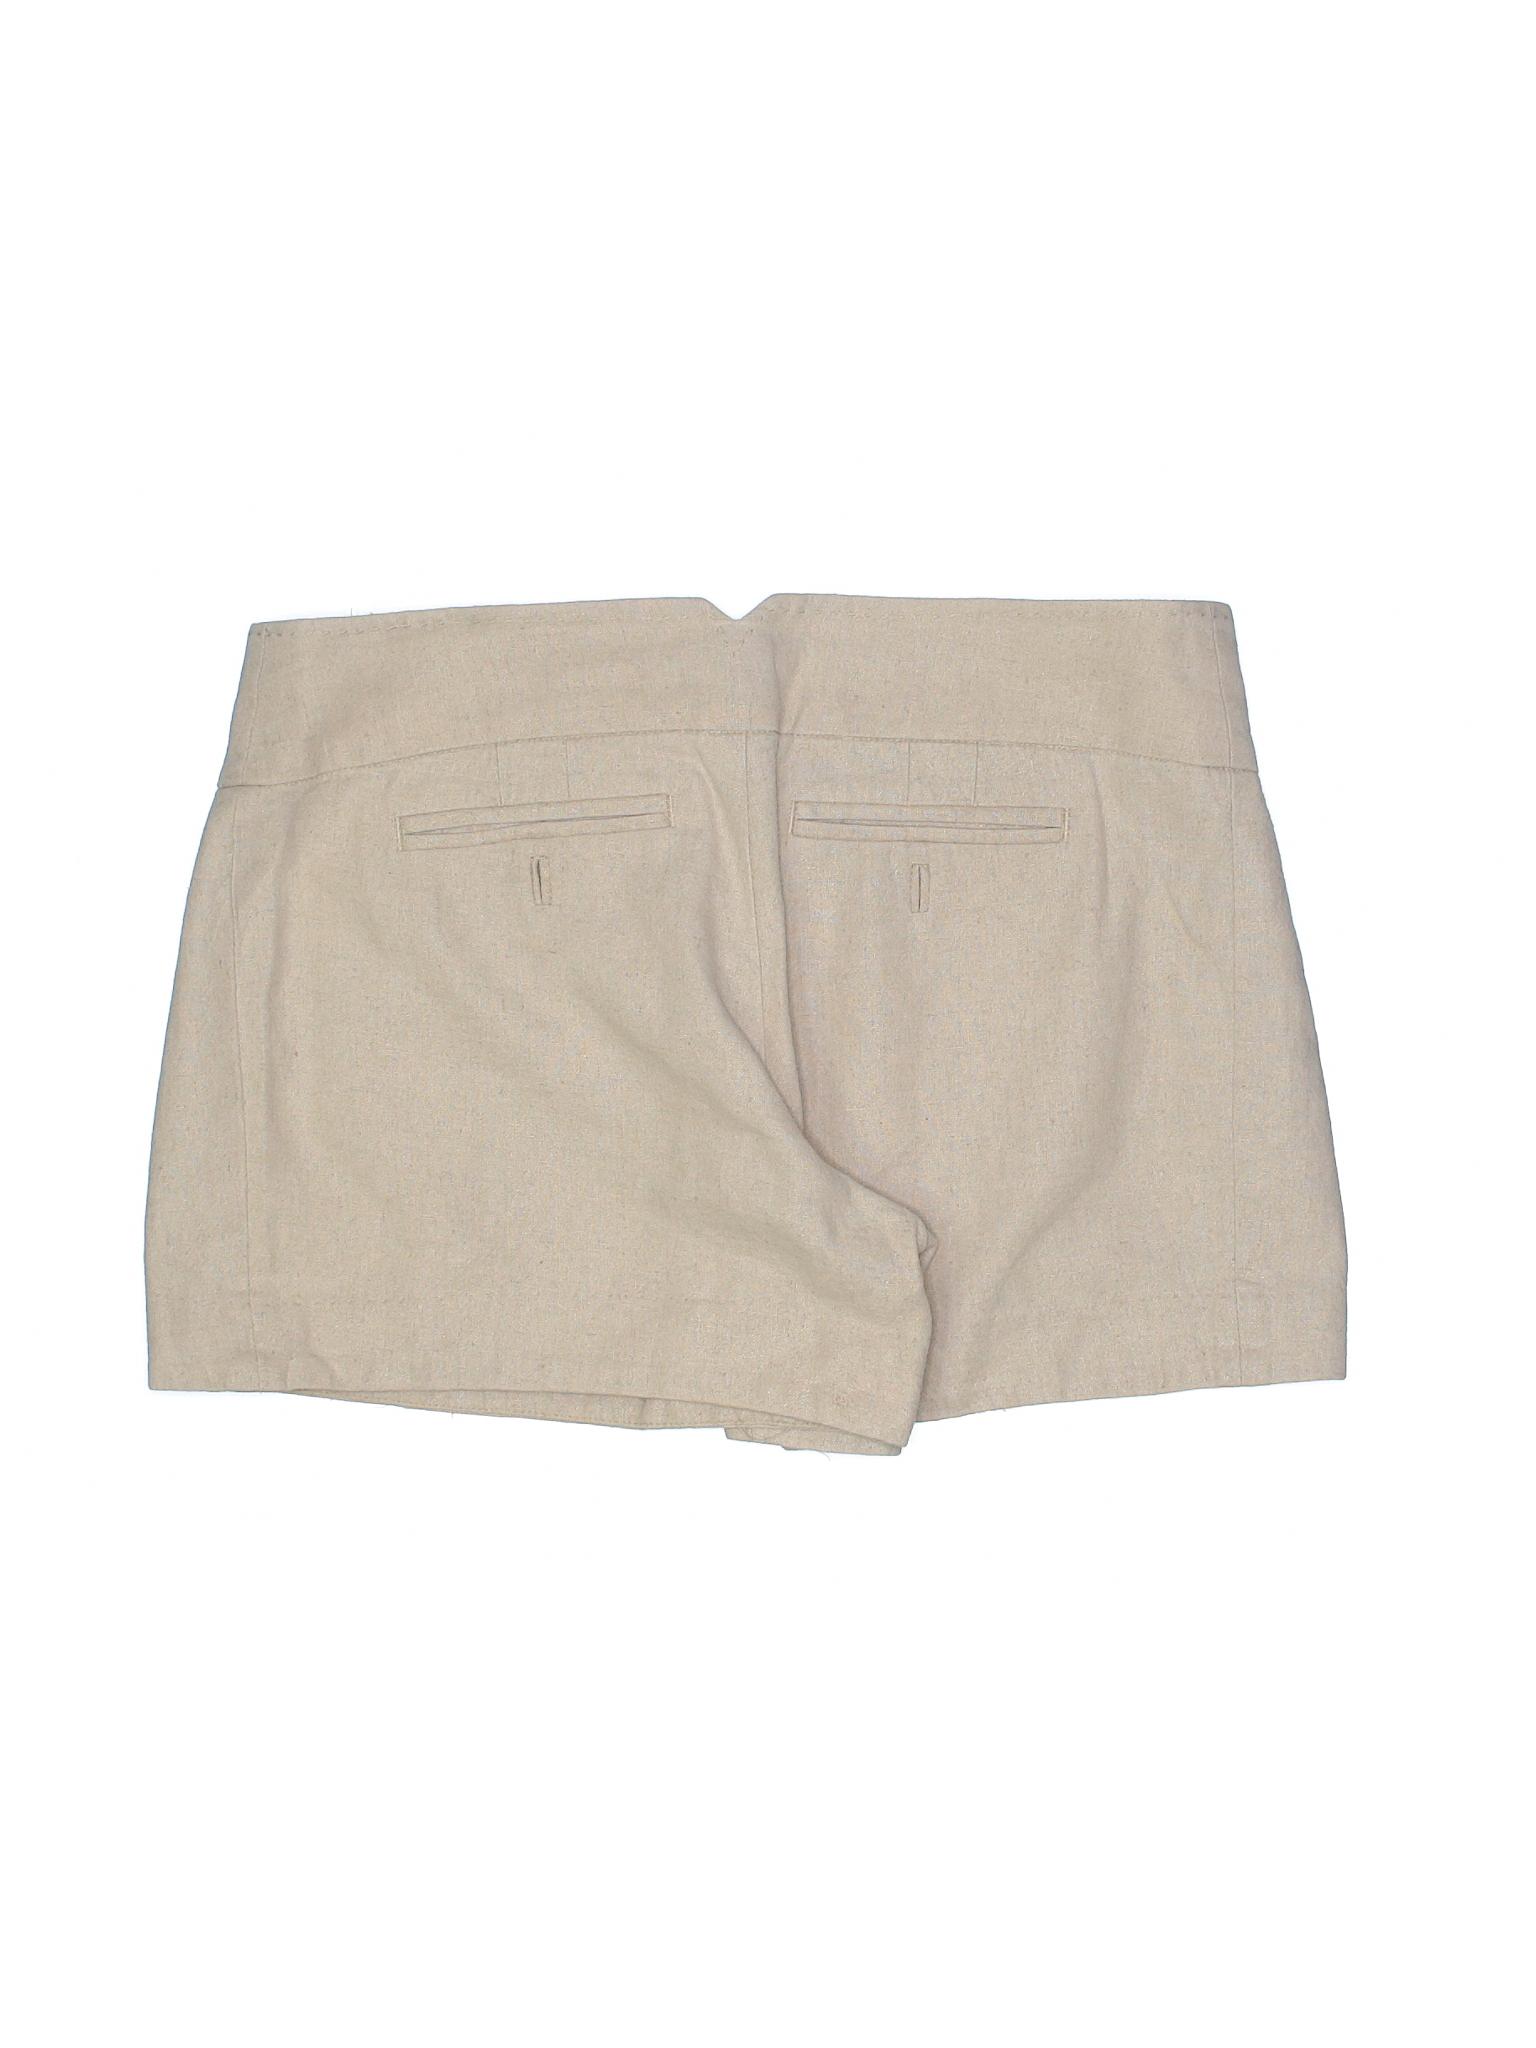 Boutique Dressy Shorts Elevenses Shorts Shorts Boutique Dressy Boutique Elevenses Dressy Boutique Elevenses 6waq6gT